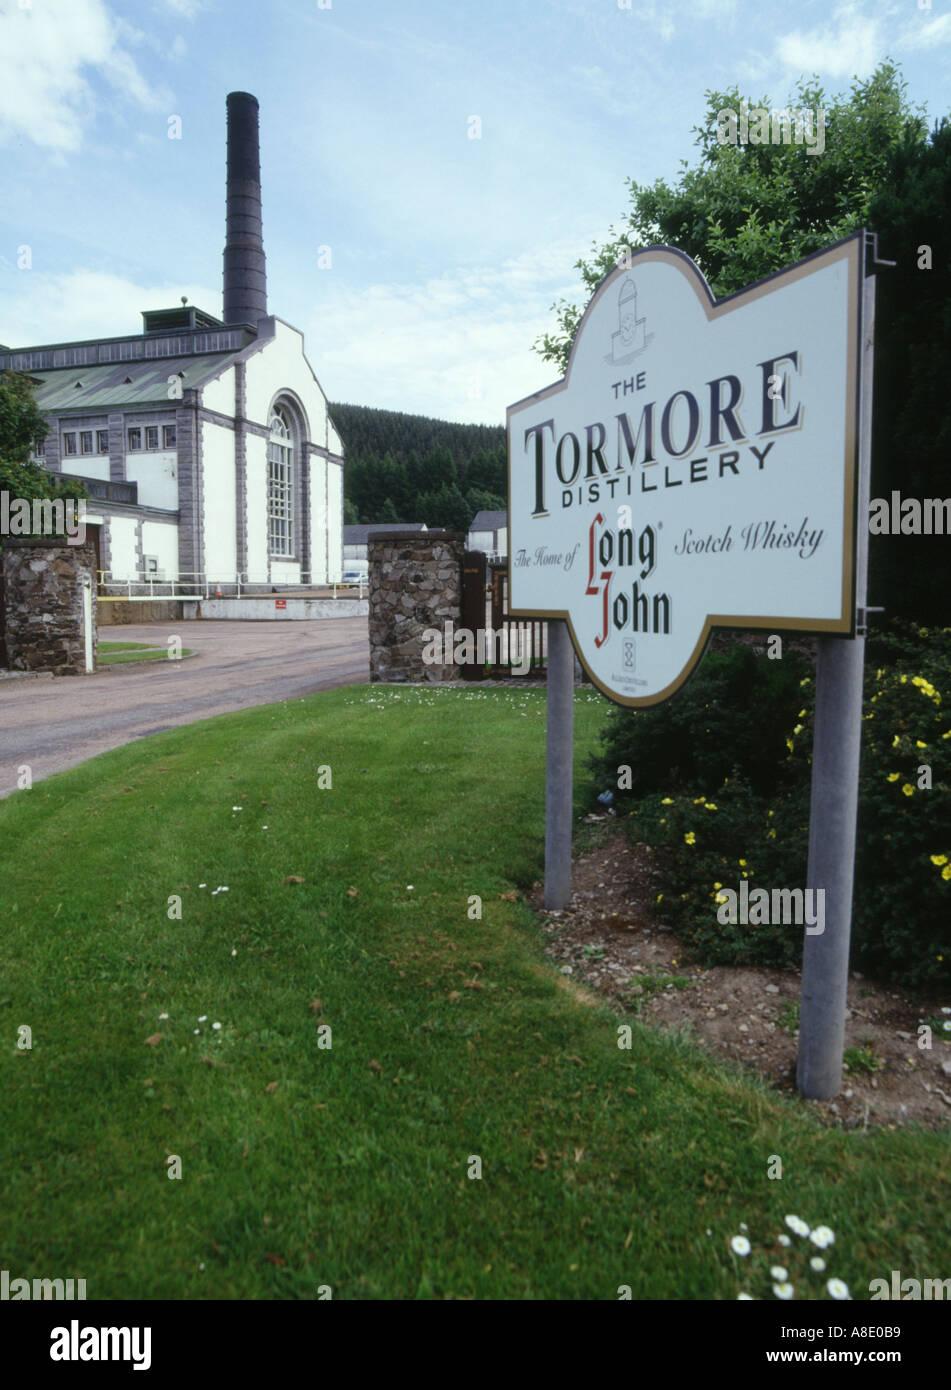 dh Tormore distillery SPEYSIDE MORAY Distillery buildings Long John malt Whisky trail scotland scottish highlands whiskey Stock Photo